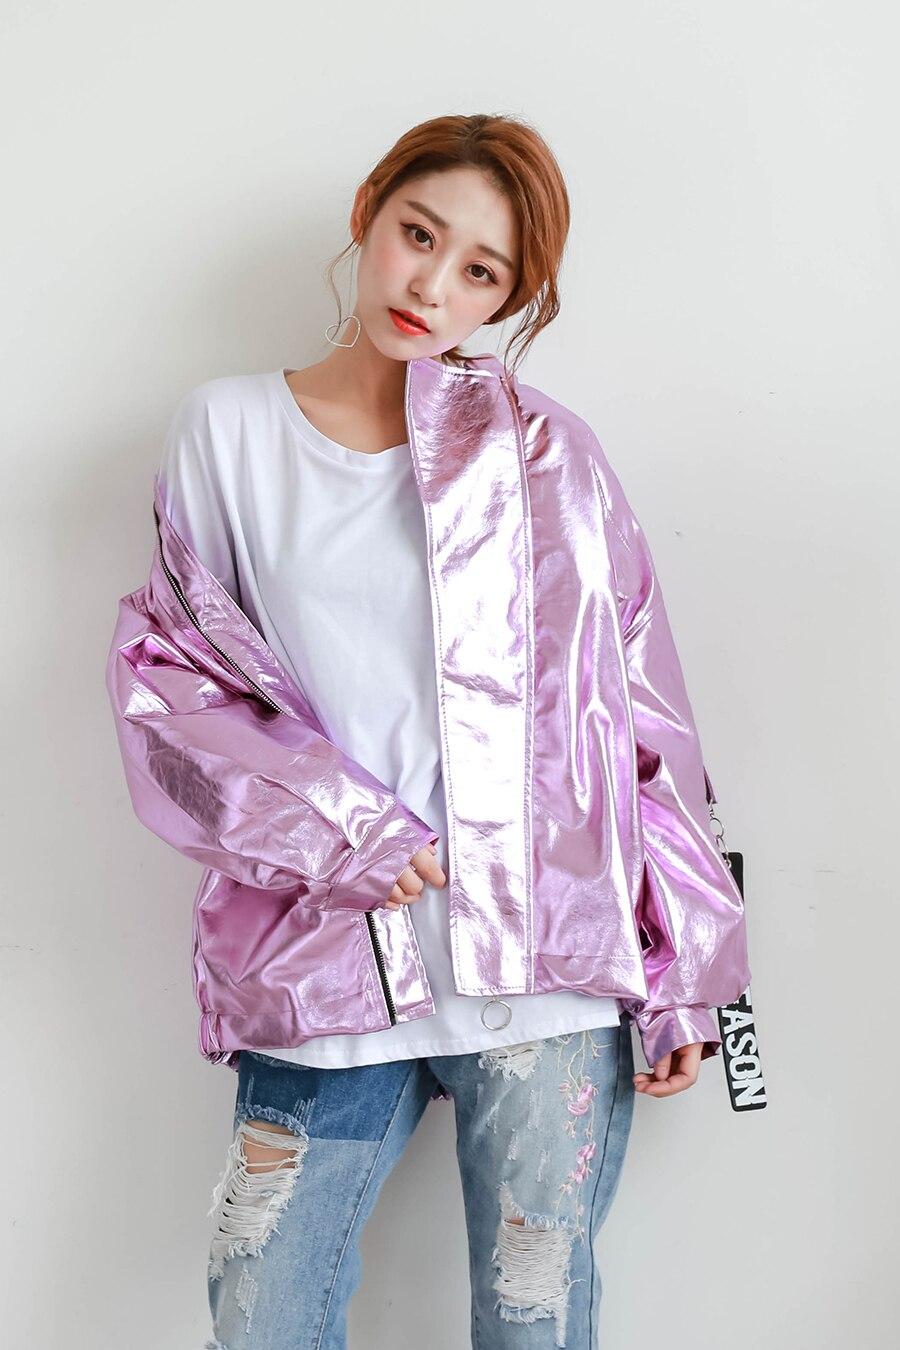 Spring Autumn Metal Bomber Jacket Pink Silver Hologram Parka Coat Punk Hip Hop Loosen Casual Women Men Outwear Chaqueta Mujer